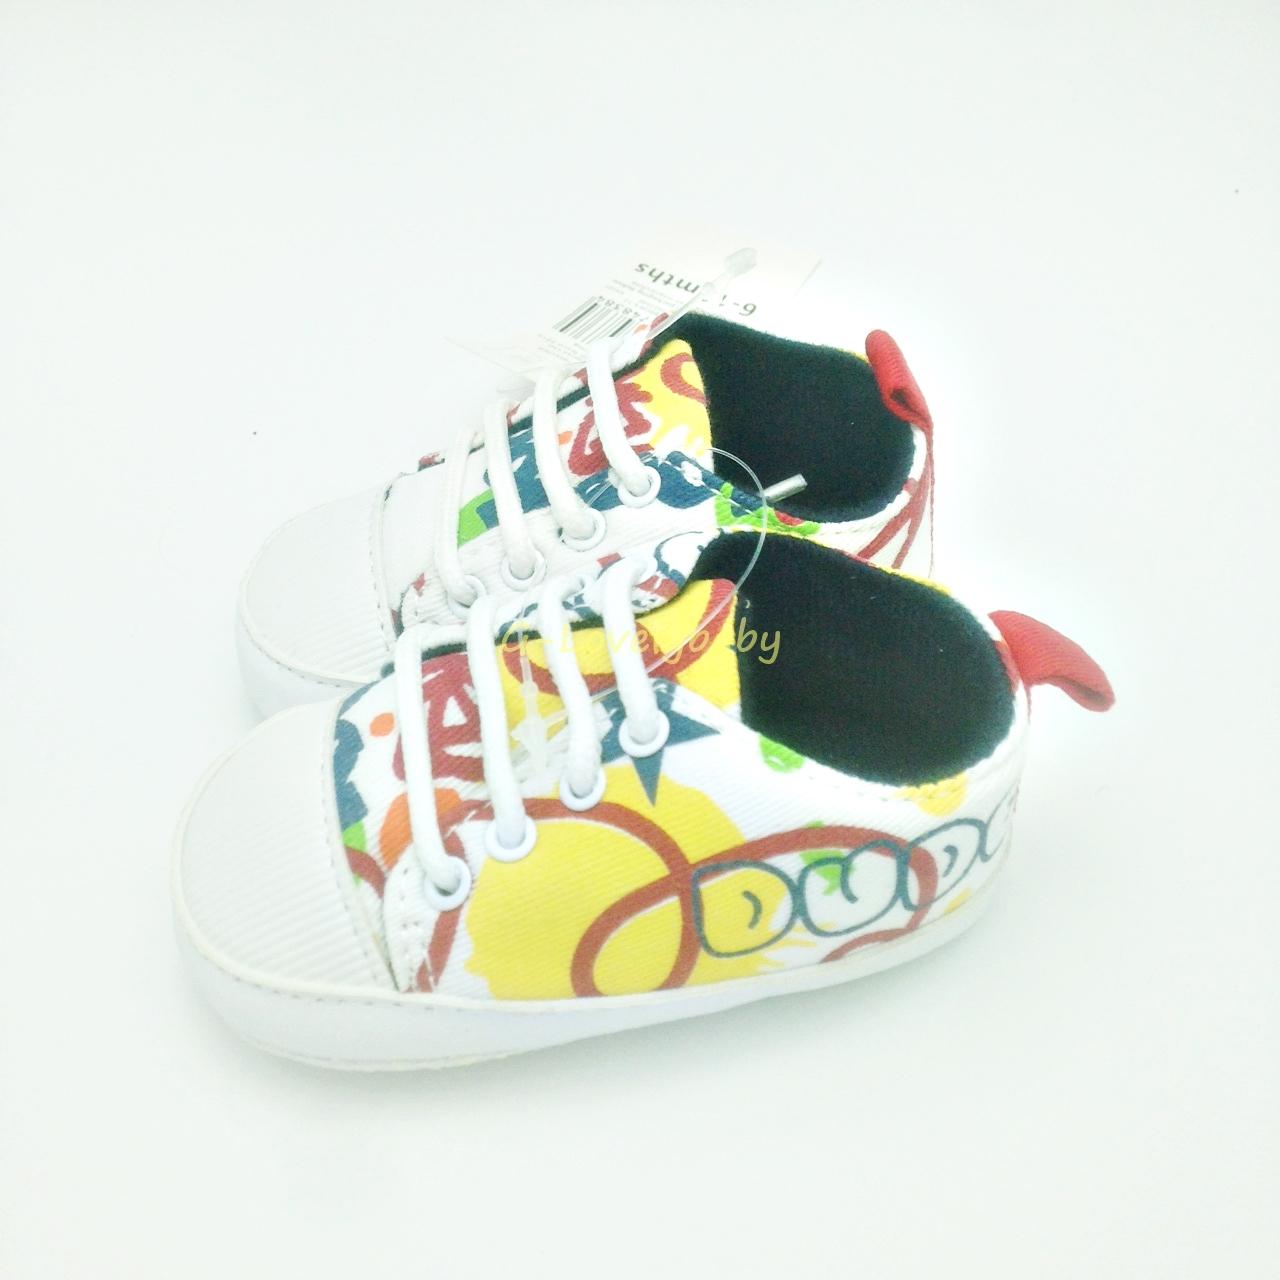 Pre-walker Baby Shoes รองเท้าเด็ก รองเท้าเด็กหญิง รองเท้าเด็กชาย รองเท้าเด็กวัยหัดเดิน